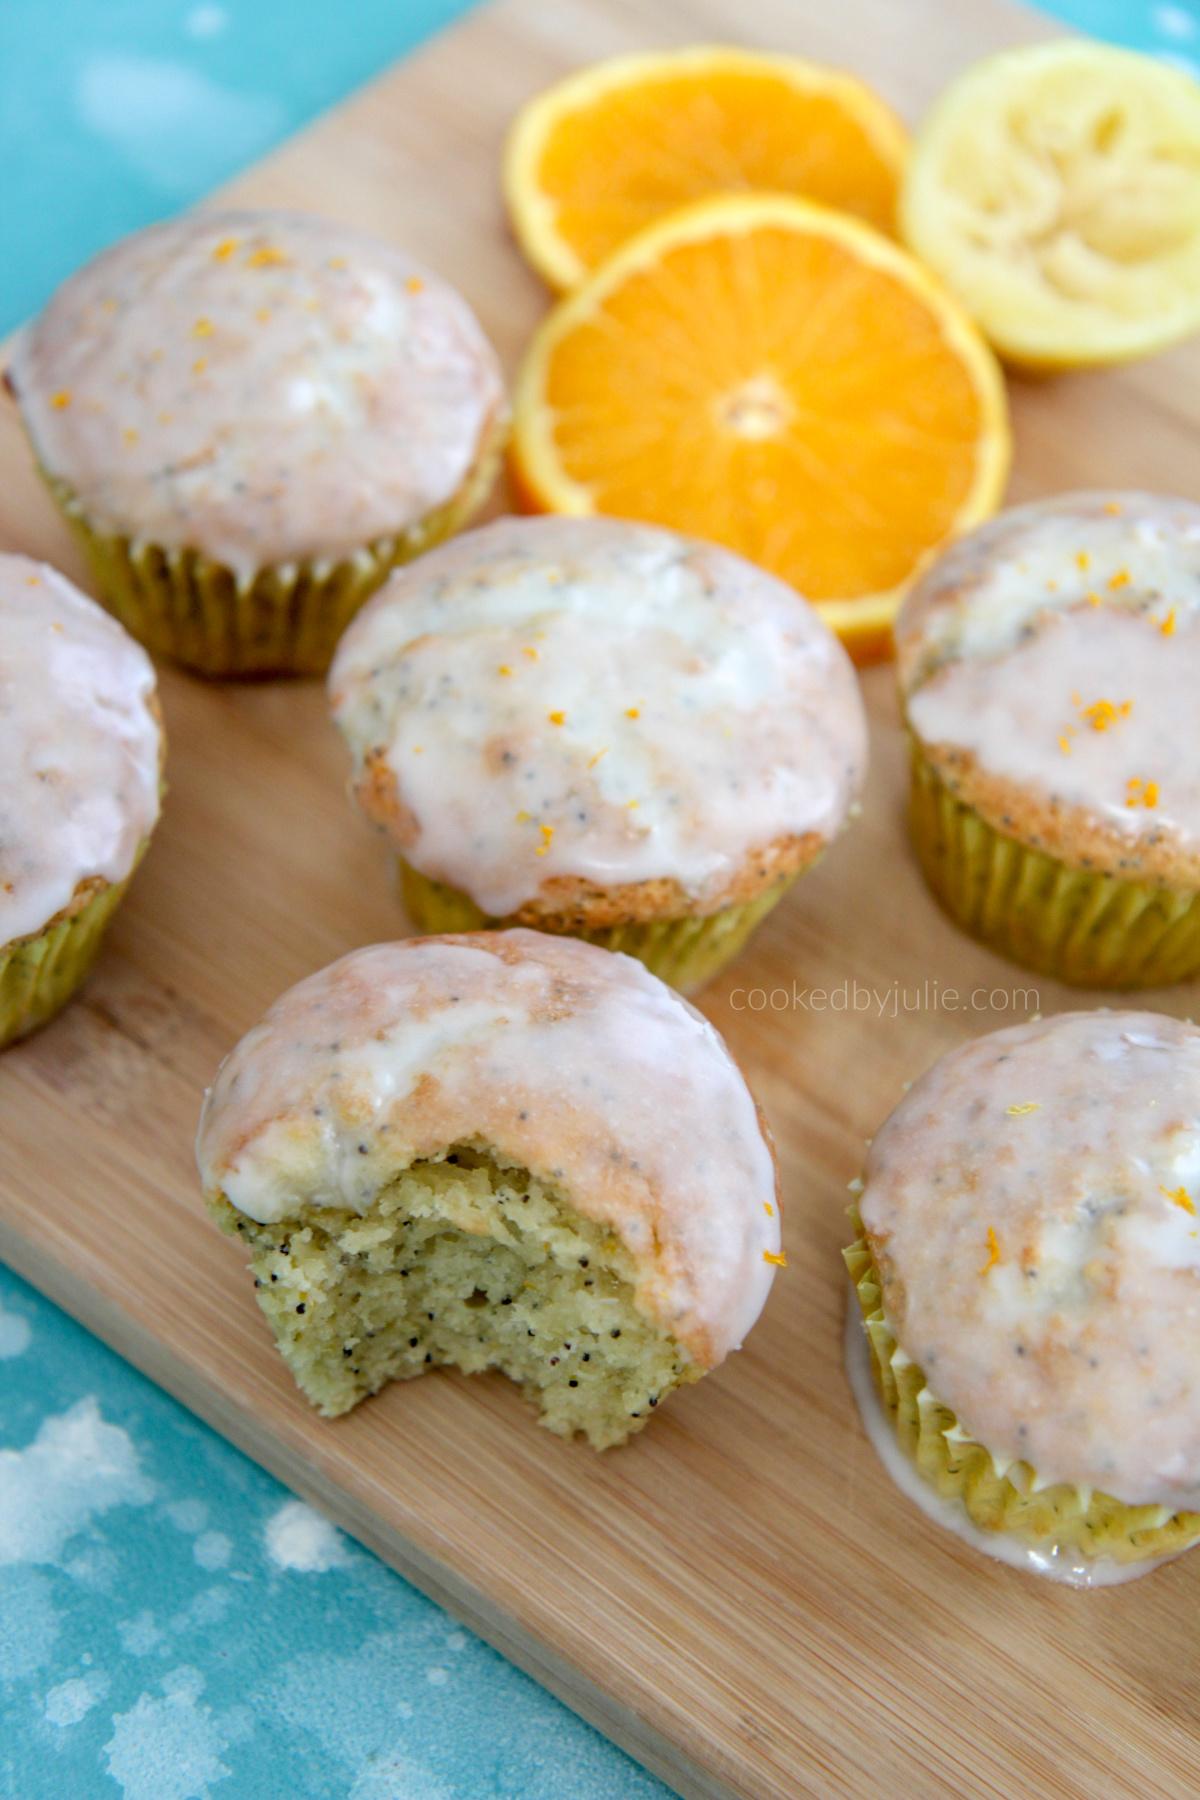 Orange Lemon Poppy Seed Muffins